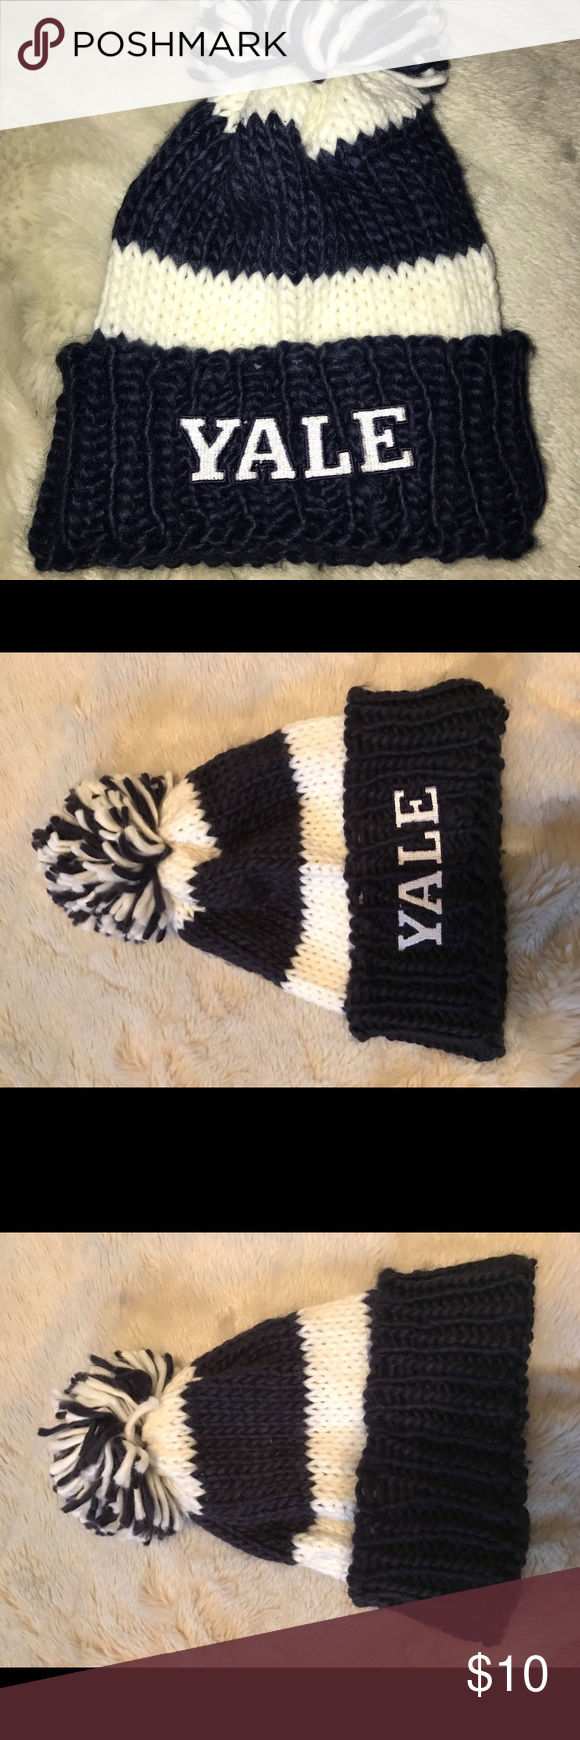 95a72cde415 Yale Pom Pom beanie hat Yale Pom Pom snow beanie hat from Forever 21.  Bought new